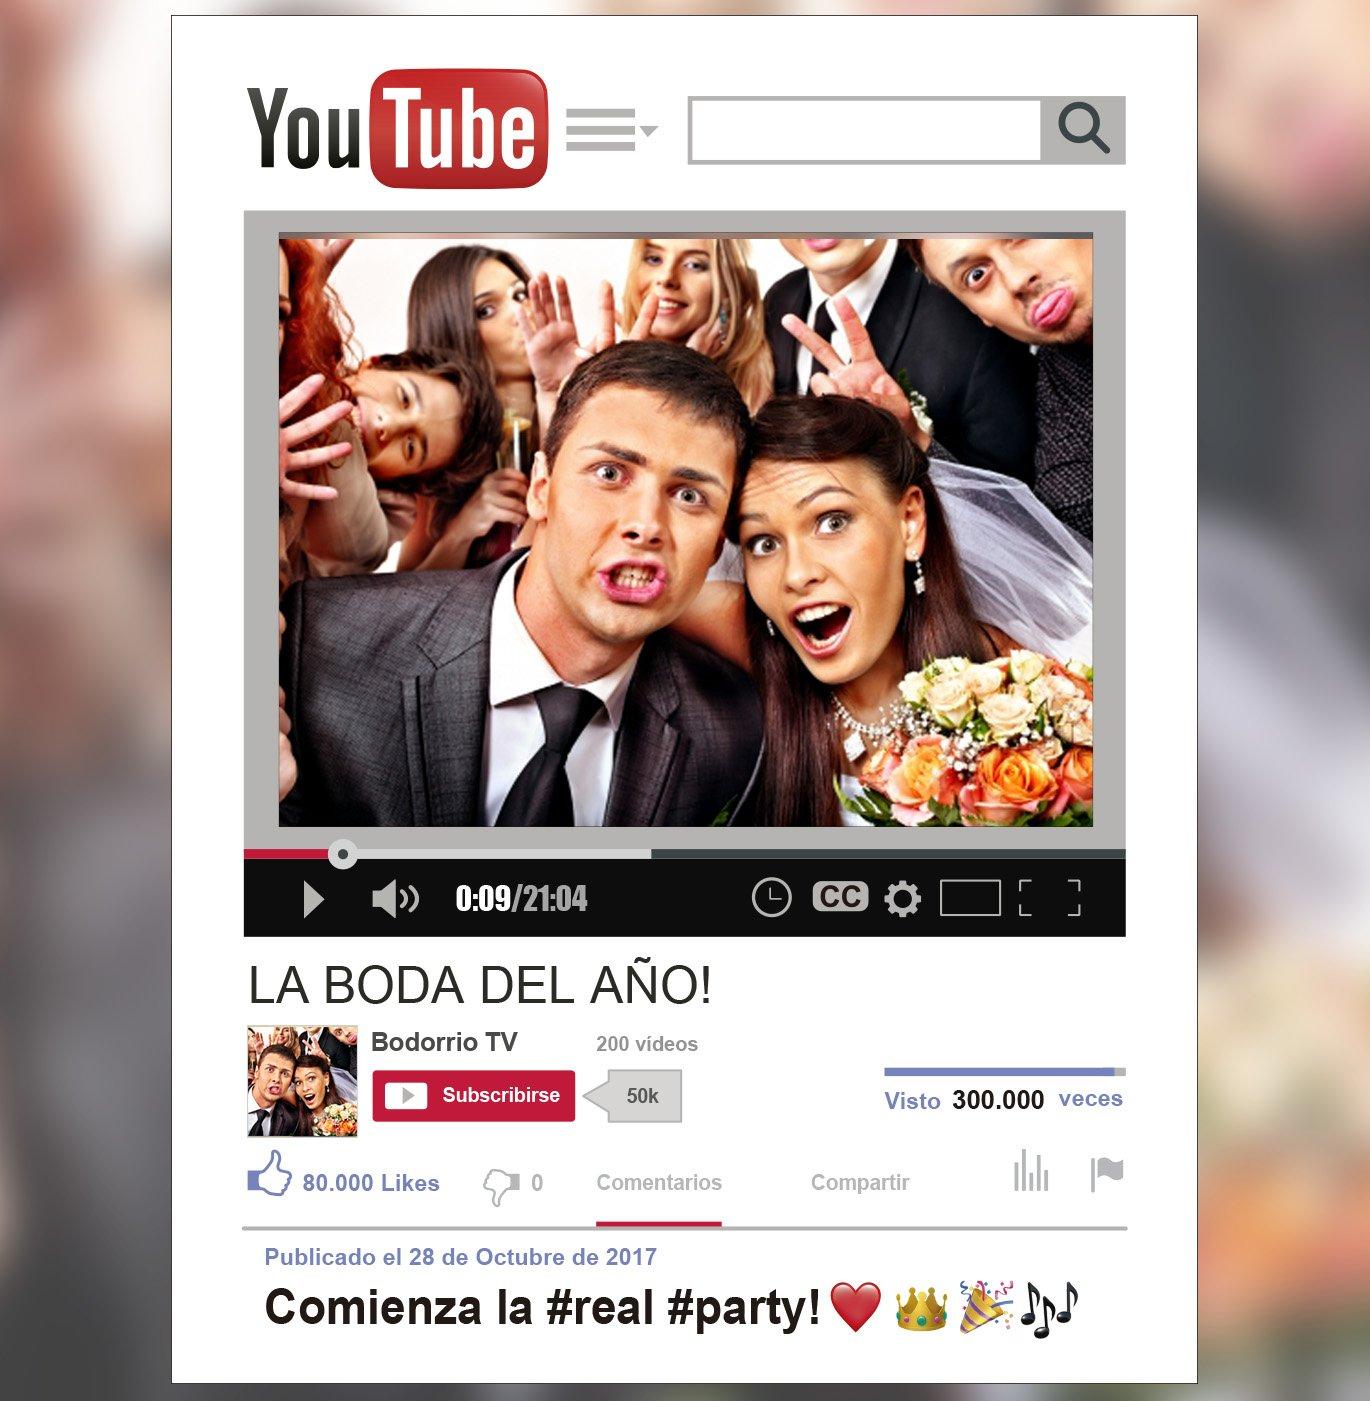 MundoPrint Marco Photocall Youtube Personalizado 90x120cm. Cartón 4mm.